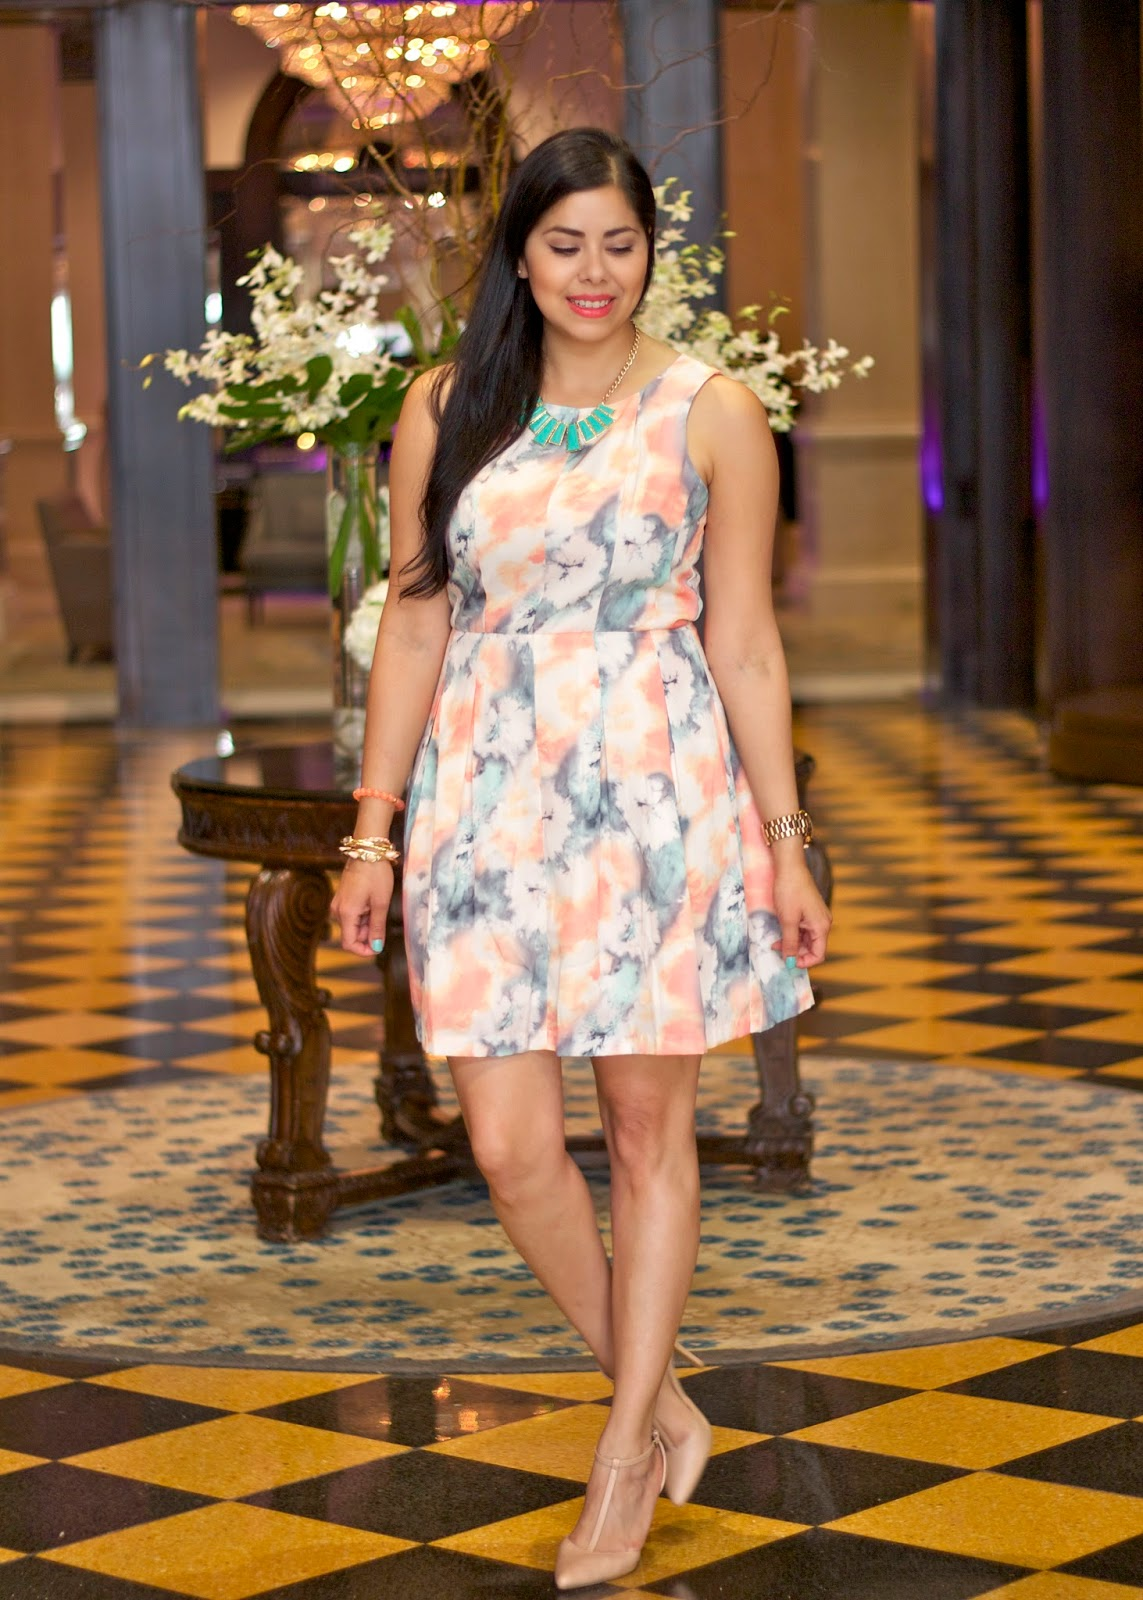 Sorbet Okay Dress Modcloth, Sorbet Dress Modcloth, Sorbet Dress, Modcloth dress on fashion blogger